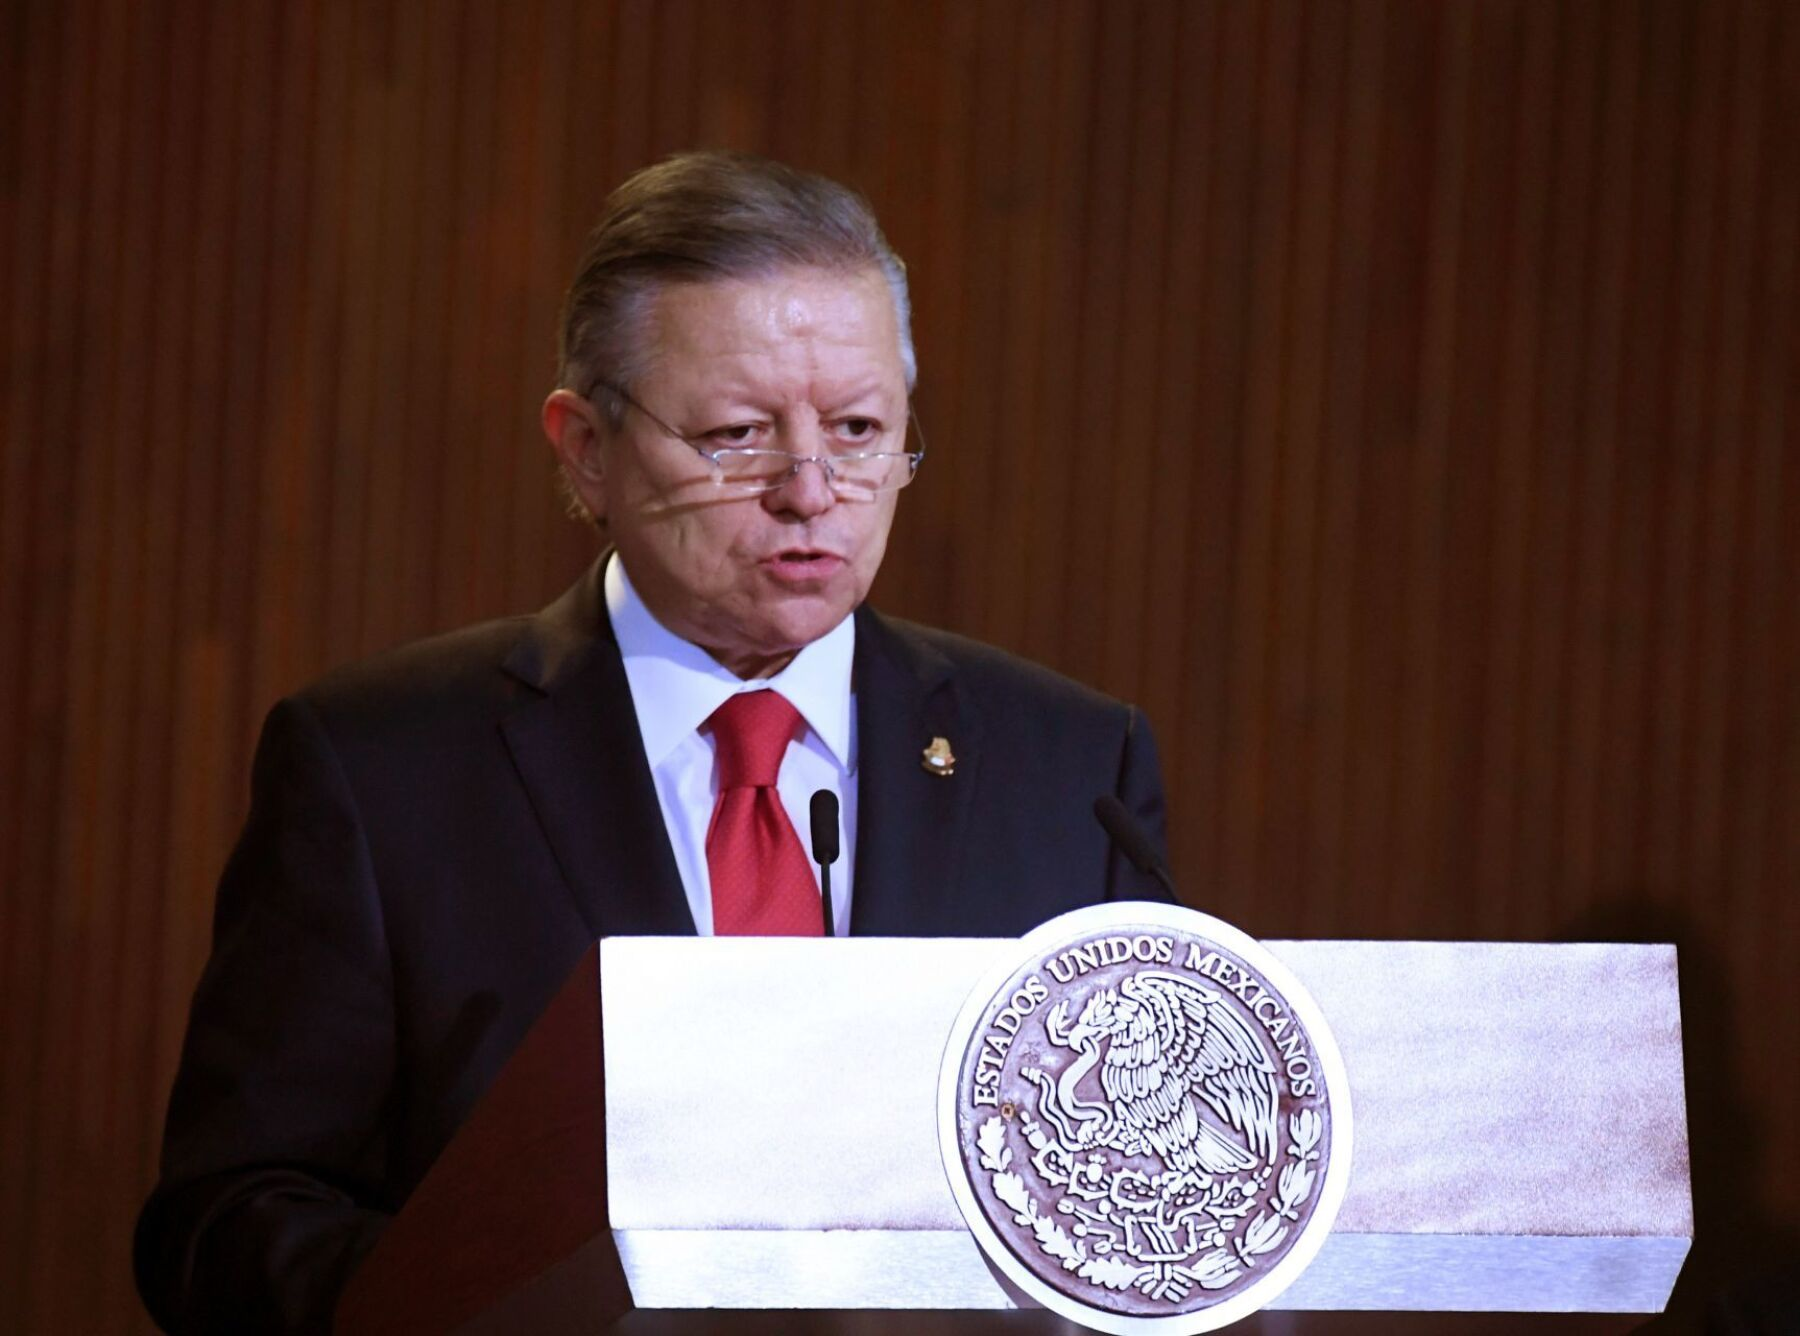 El ministro presidente Arturo Zaldívar